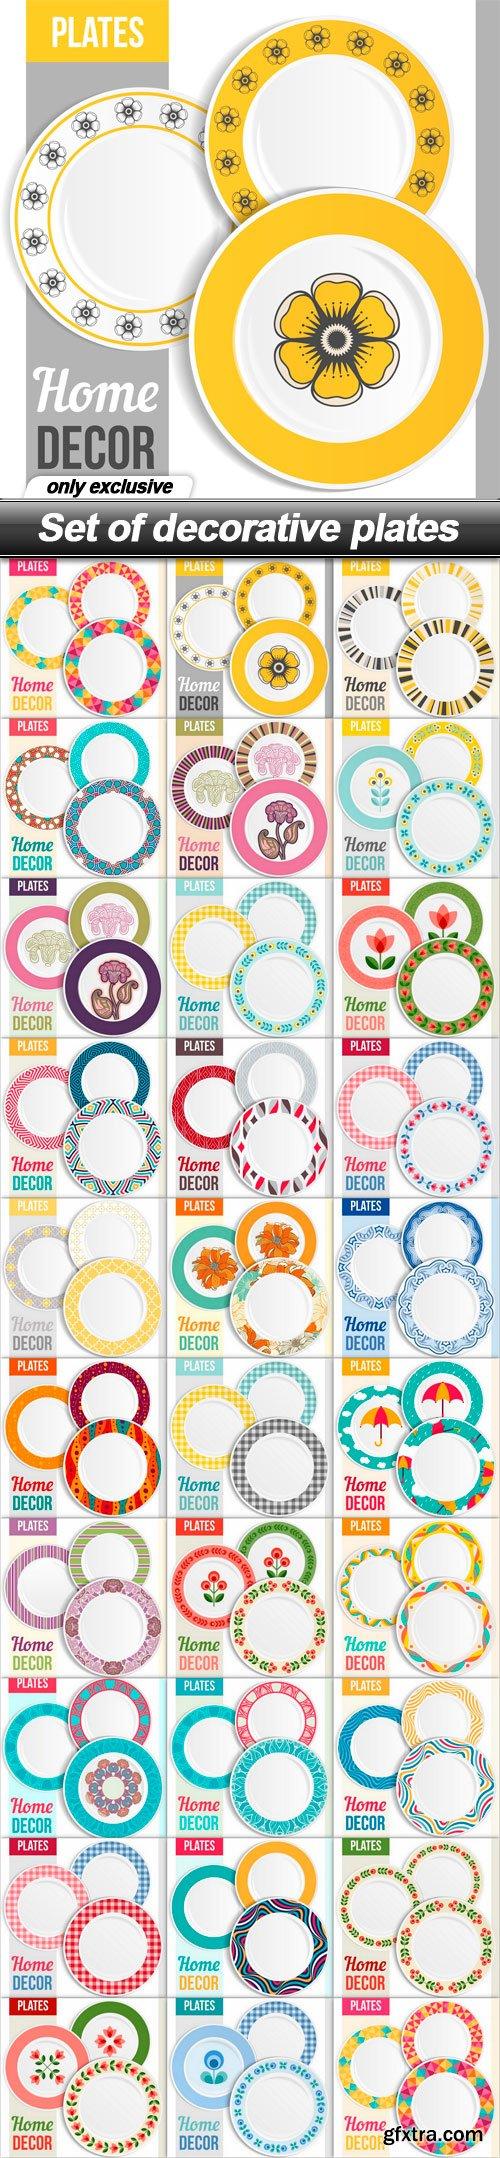 Set of decorative plates - 29 EPS